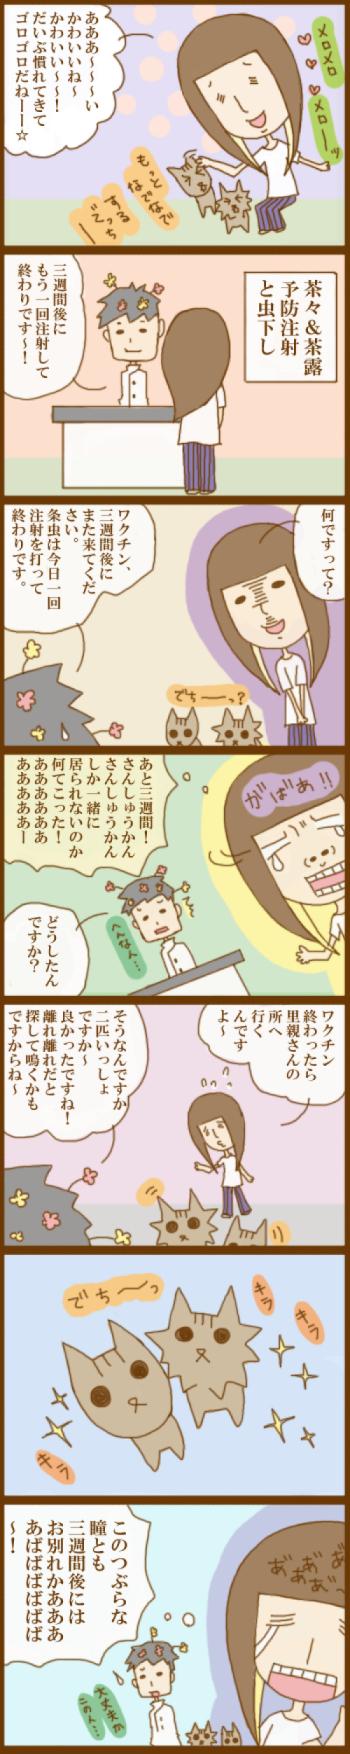 f:id:suzuokayu:20201125103249j:plain